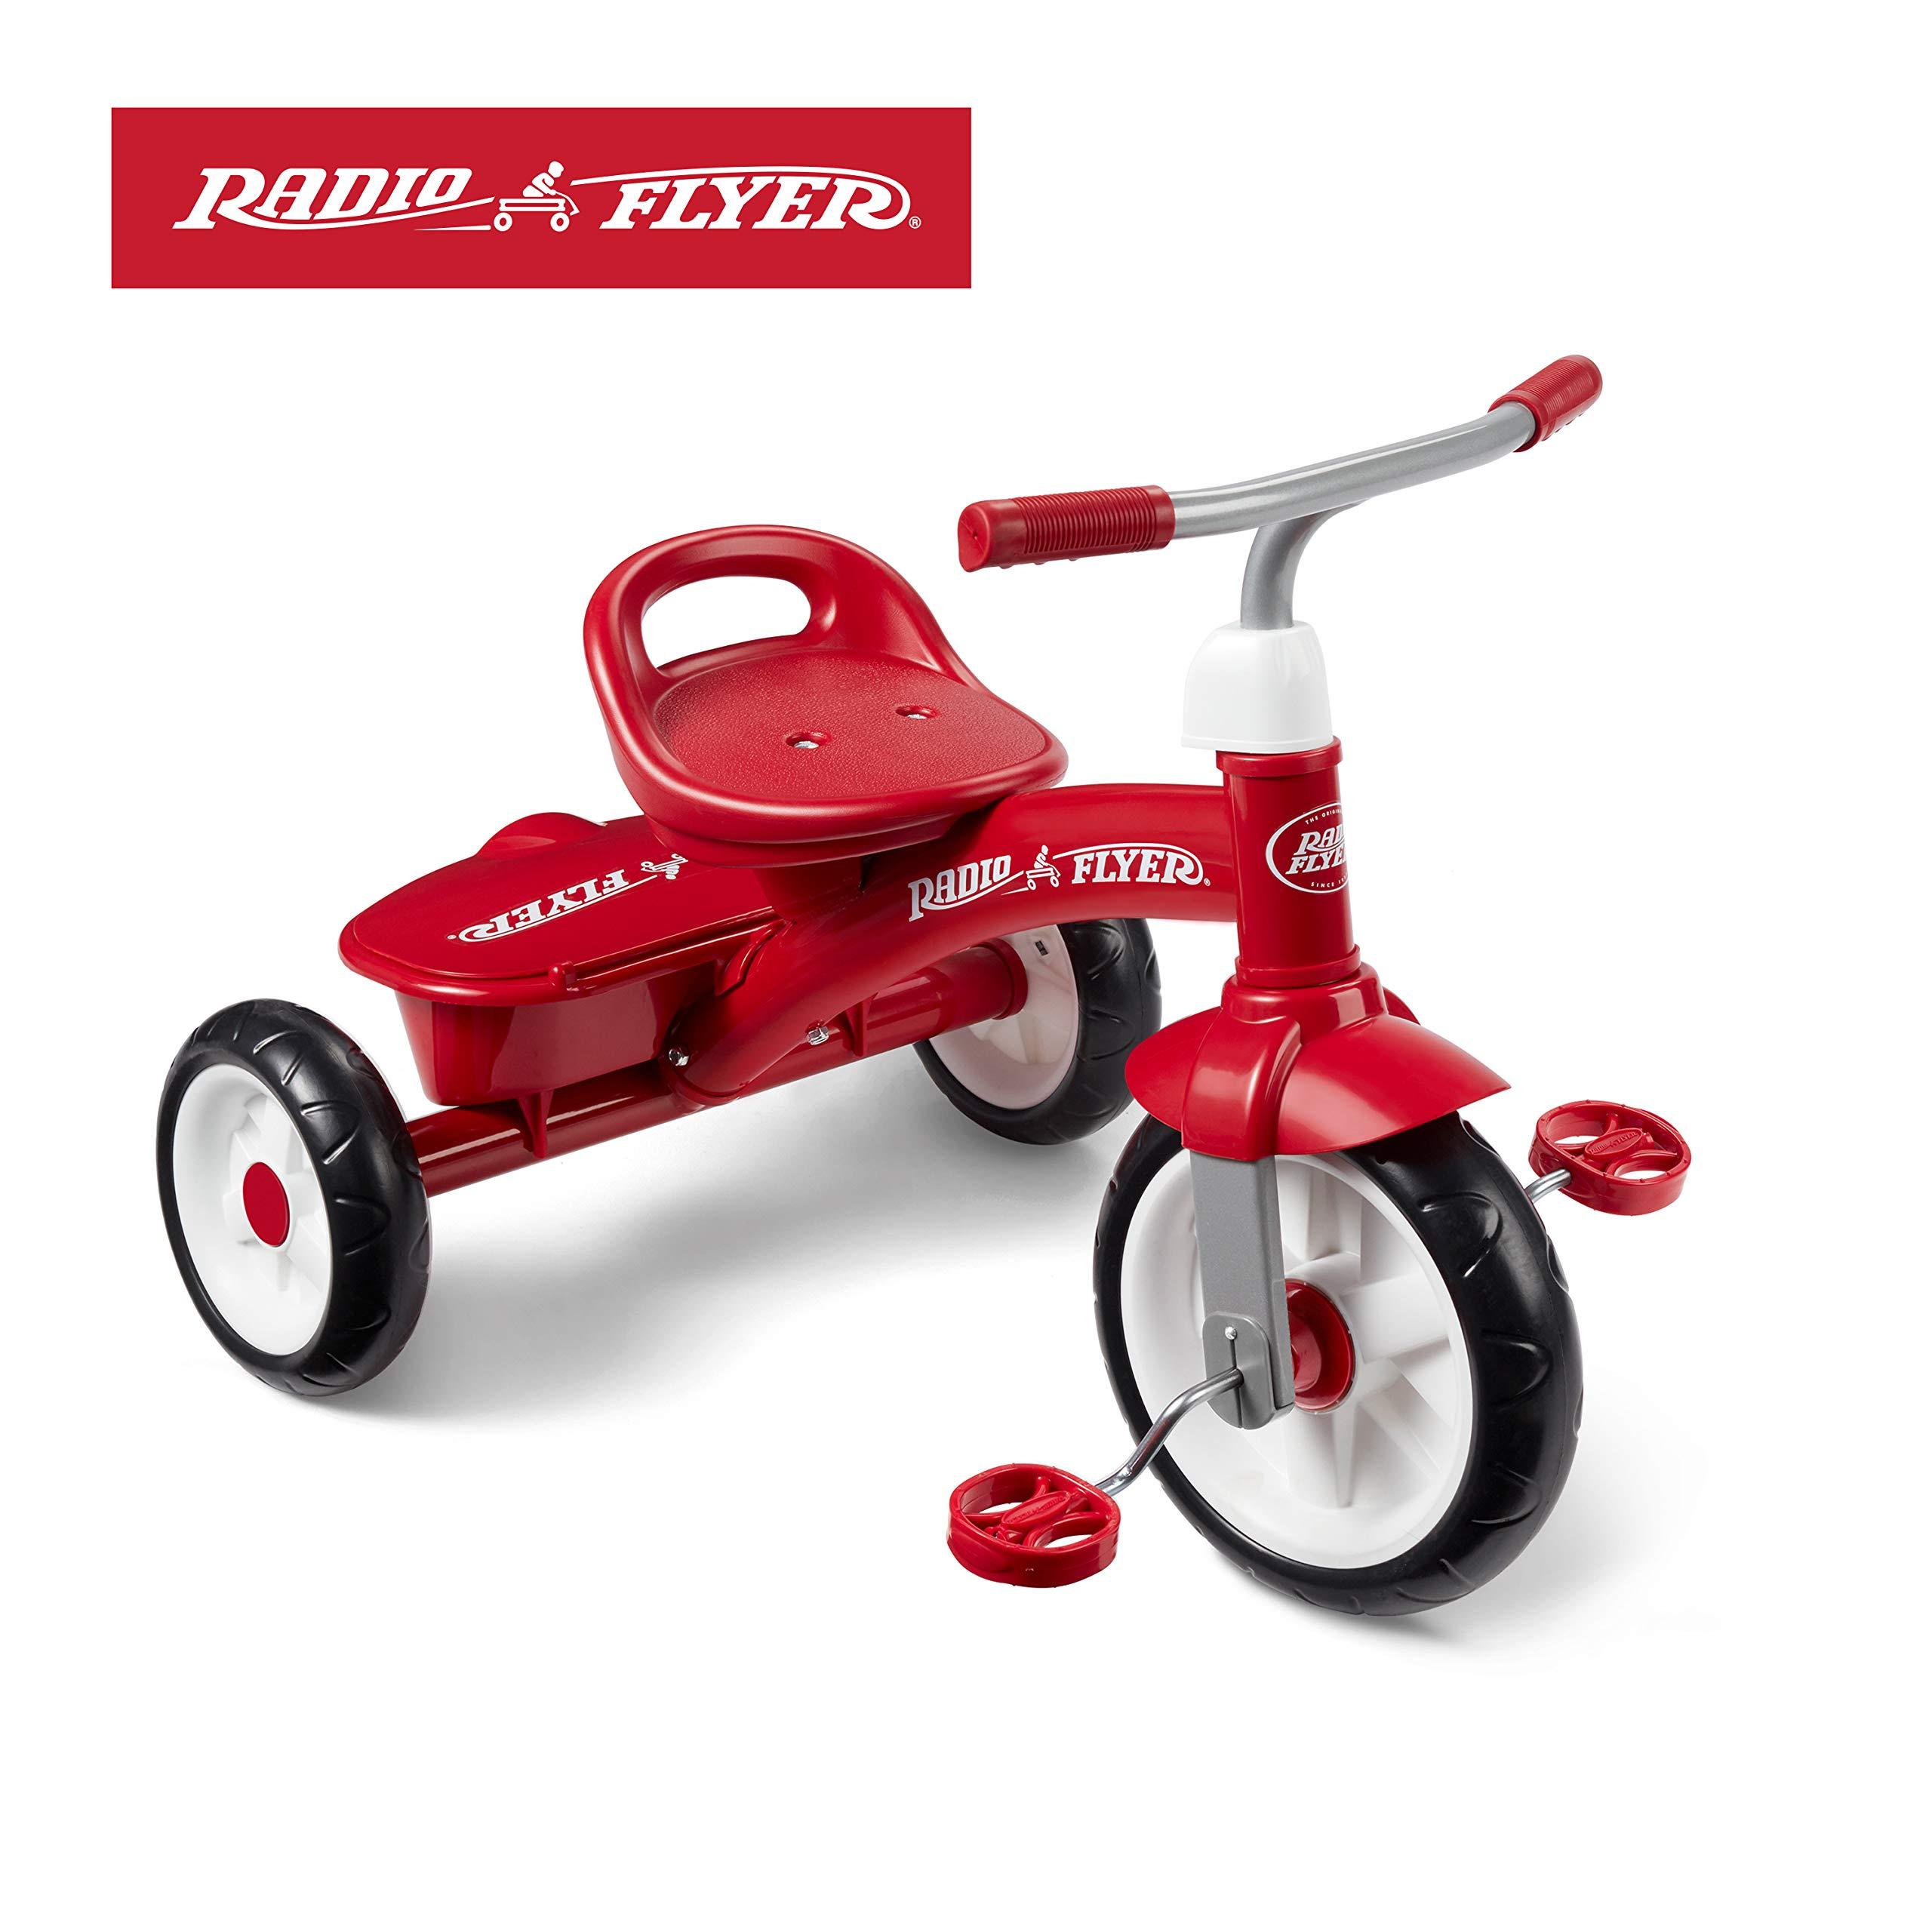 Radio Flyer Red Rider Trike by Radio Flyer